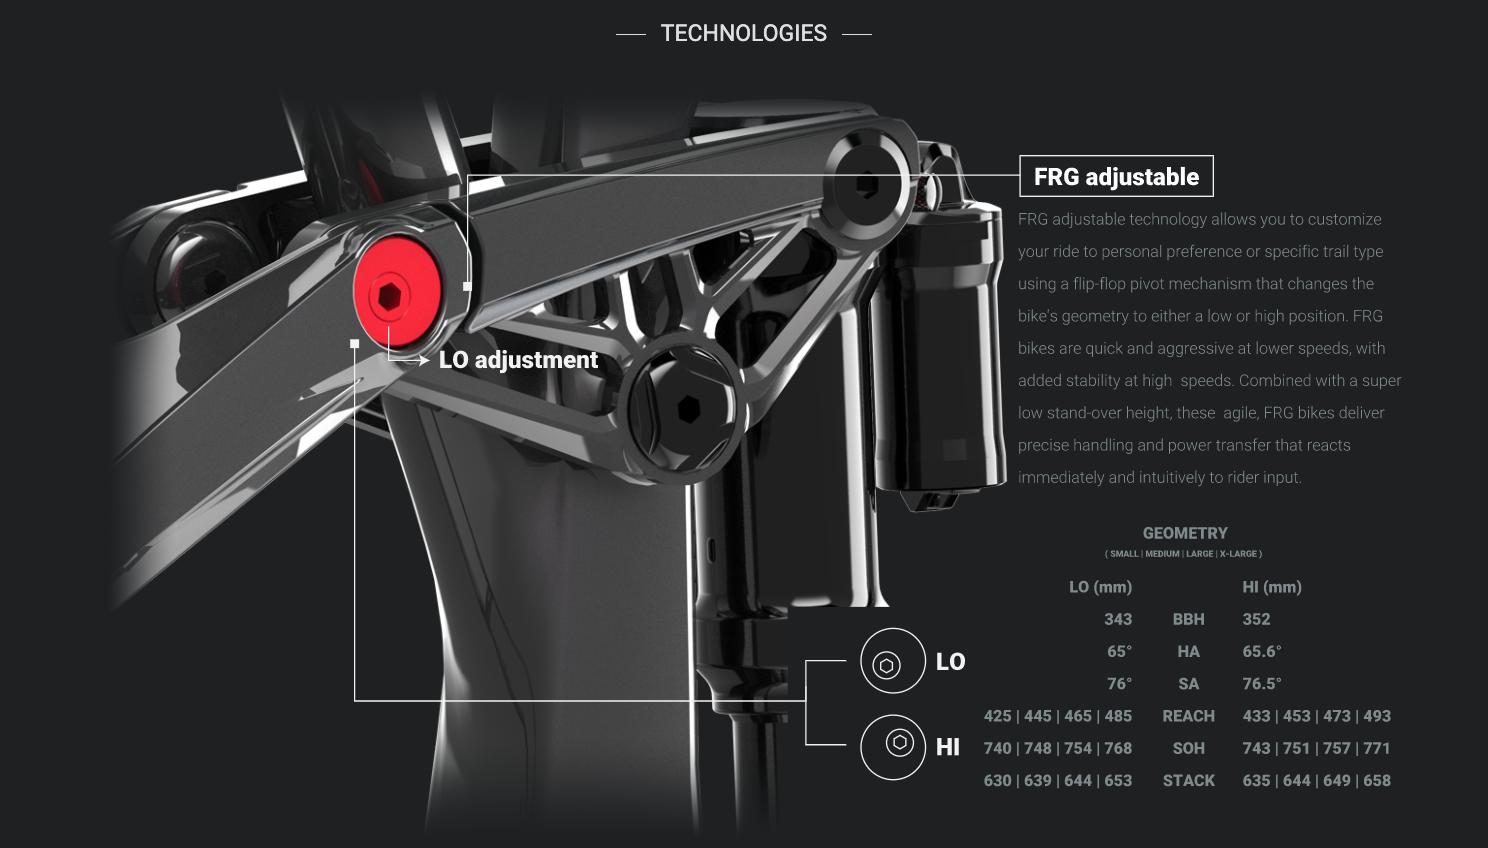 FRG Adjustable Technology